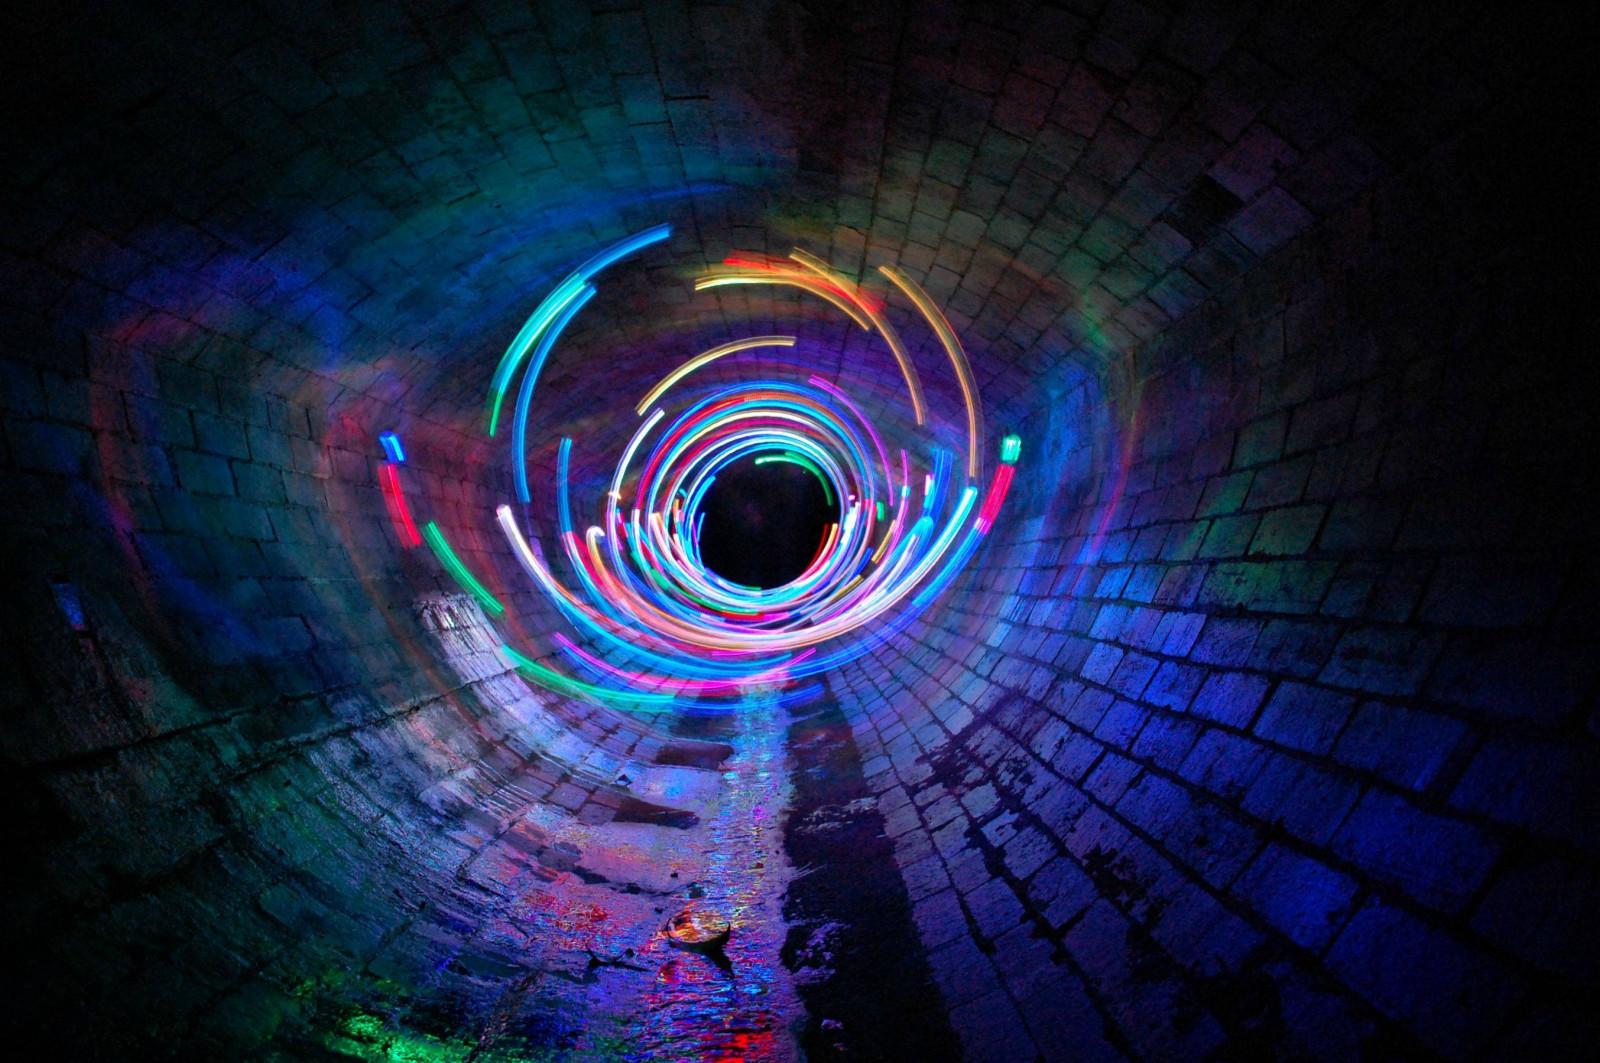 30 Light Effect Wallpapers To Liven Up Your Desktop: Wallpaper : Long Exposure, Spiral, Symmetry, Blue, Light